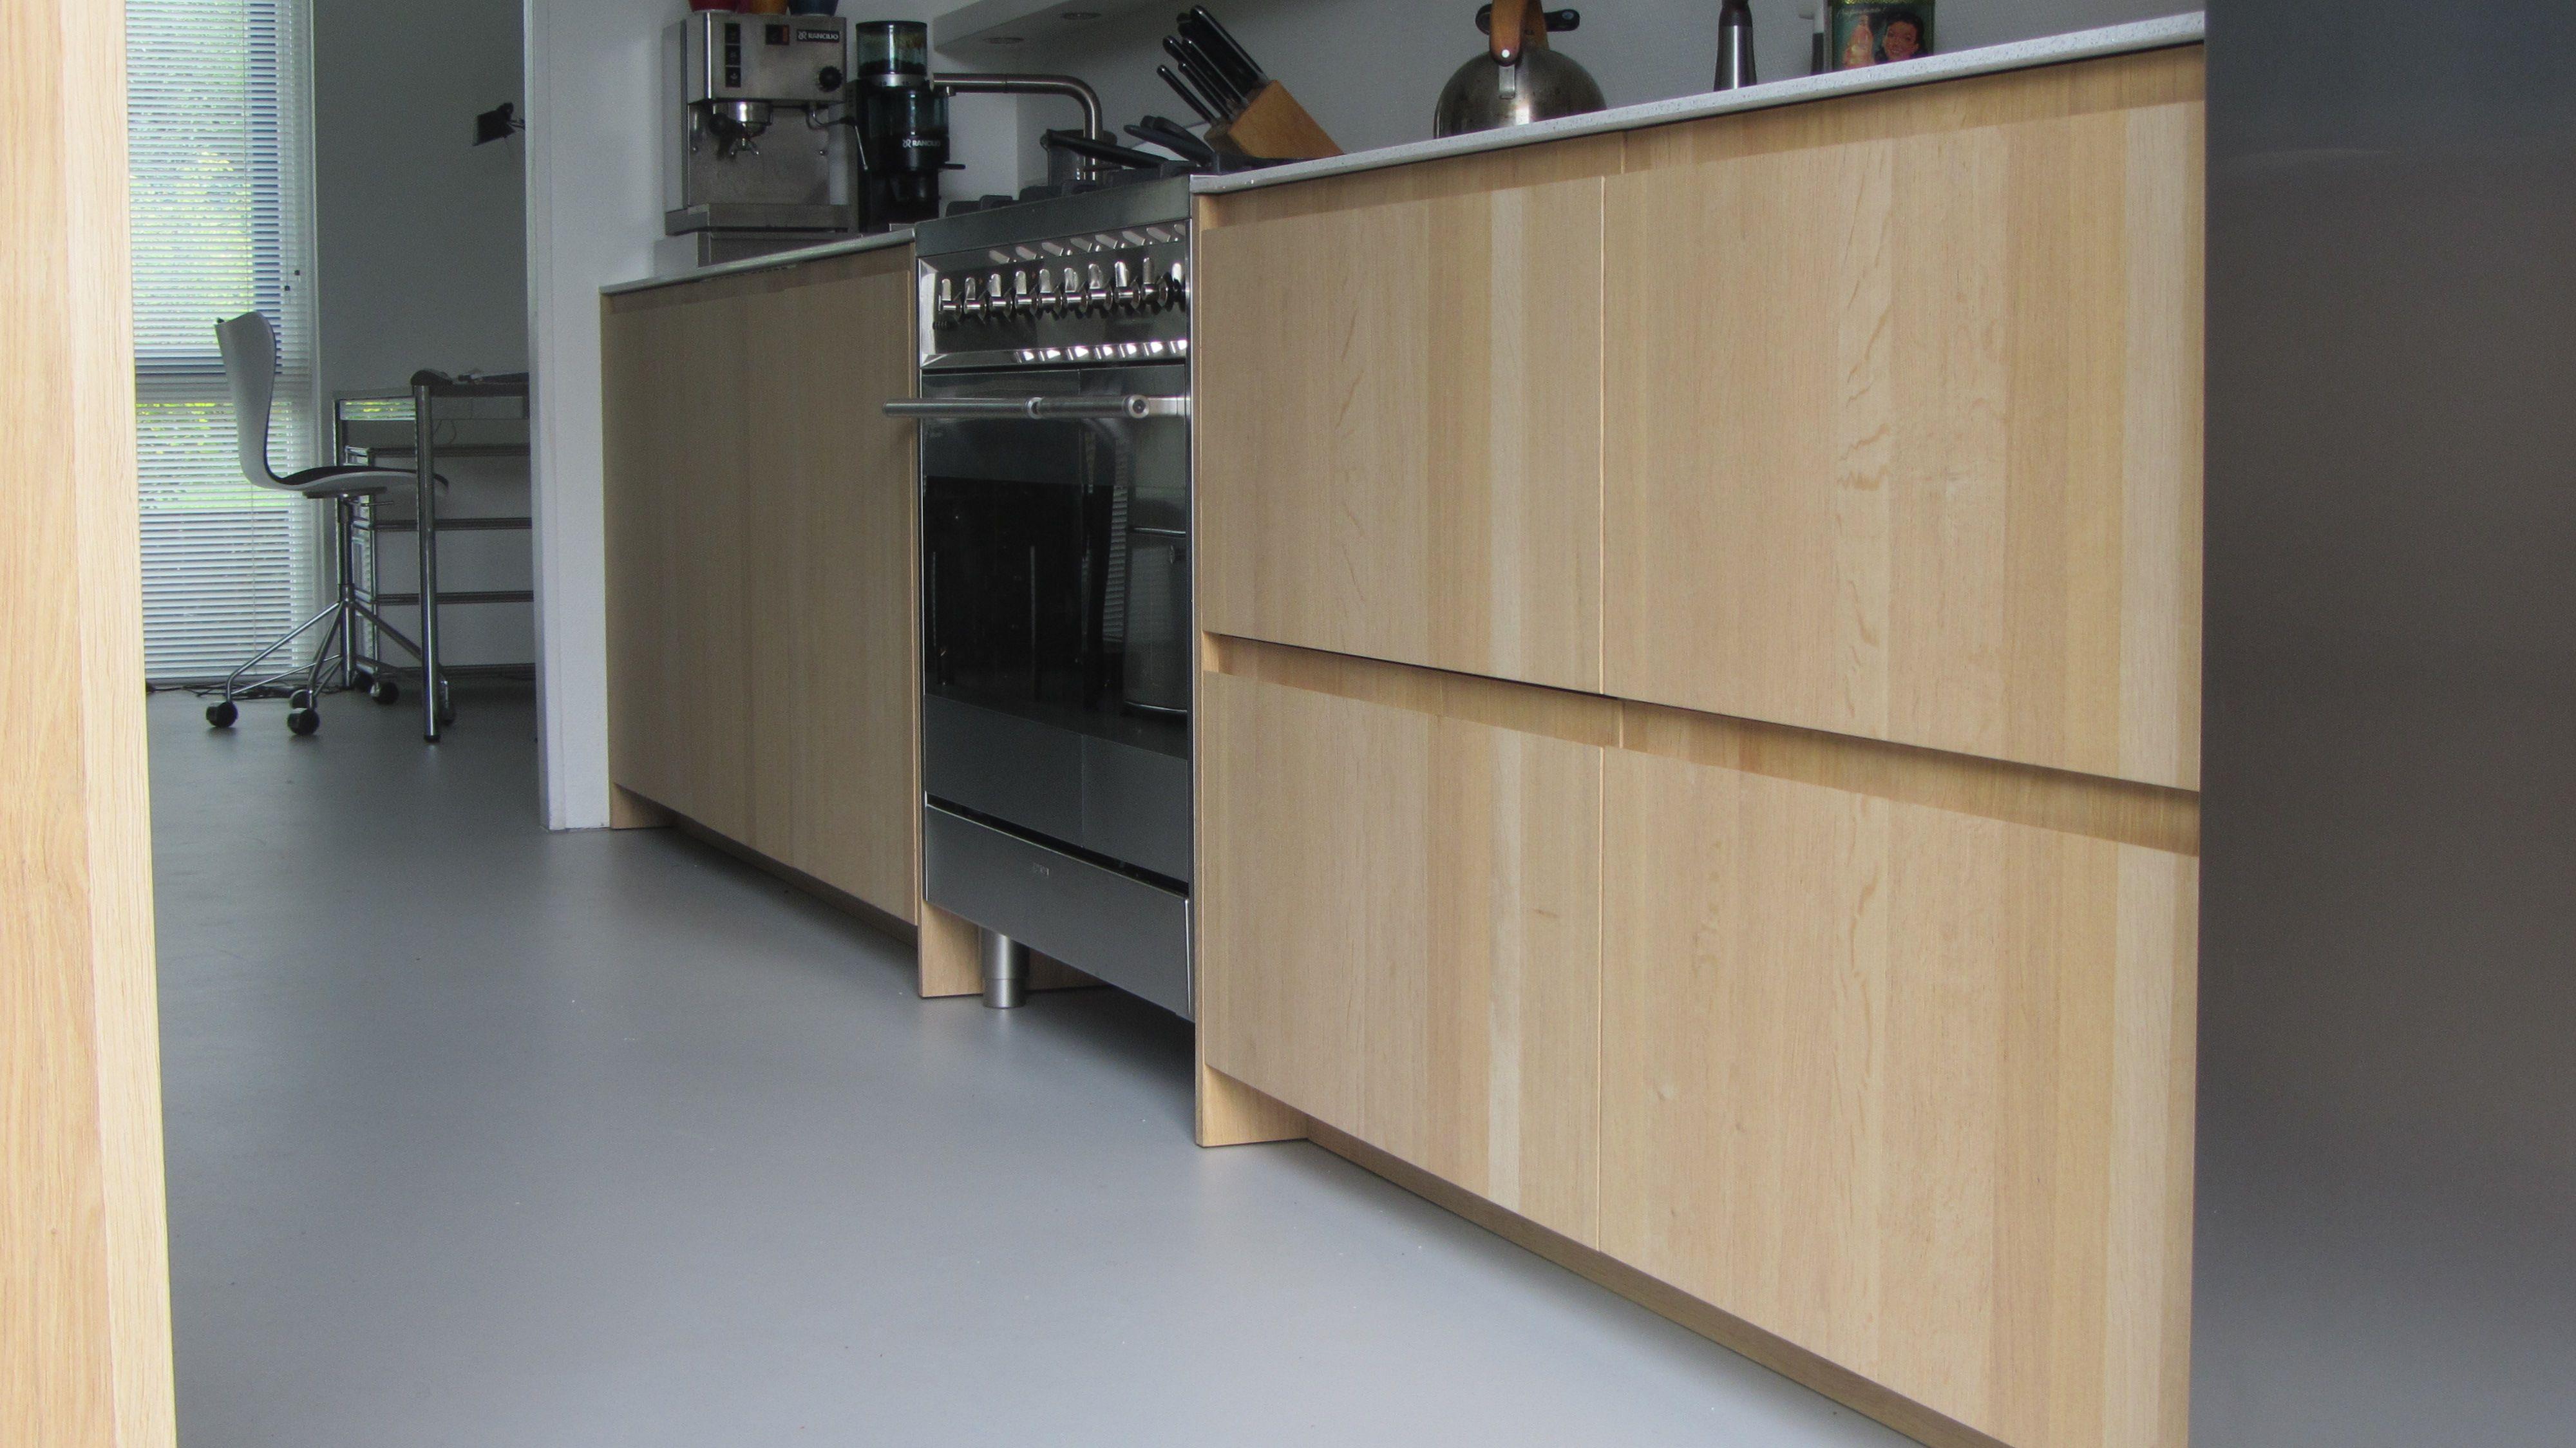 Witte Eiken Keuken : Witte eiken keuken eigentijdse moderne ruw eiken houten keukens